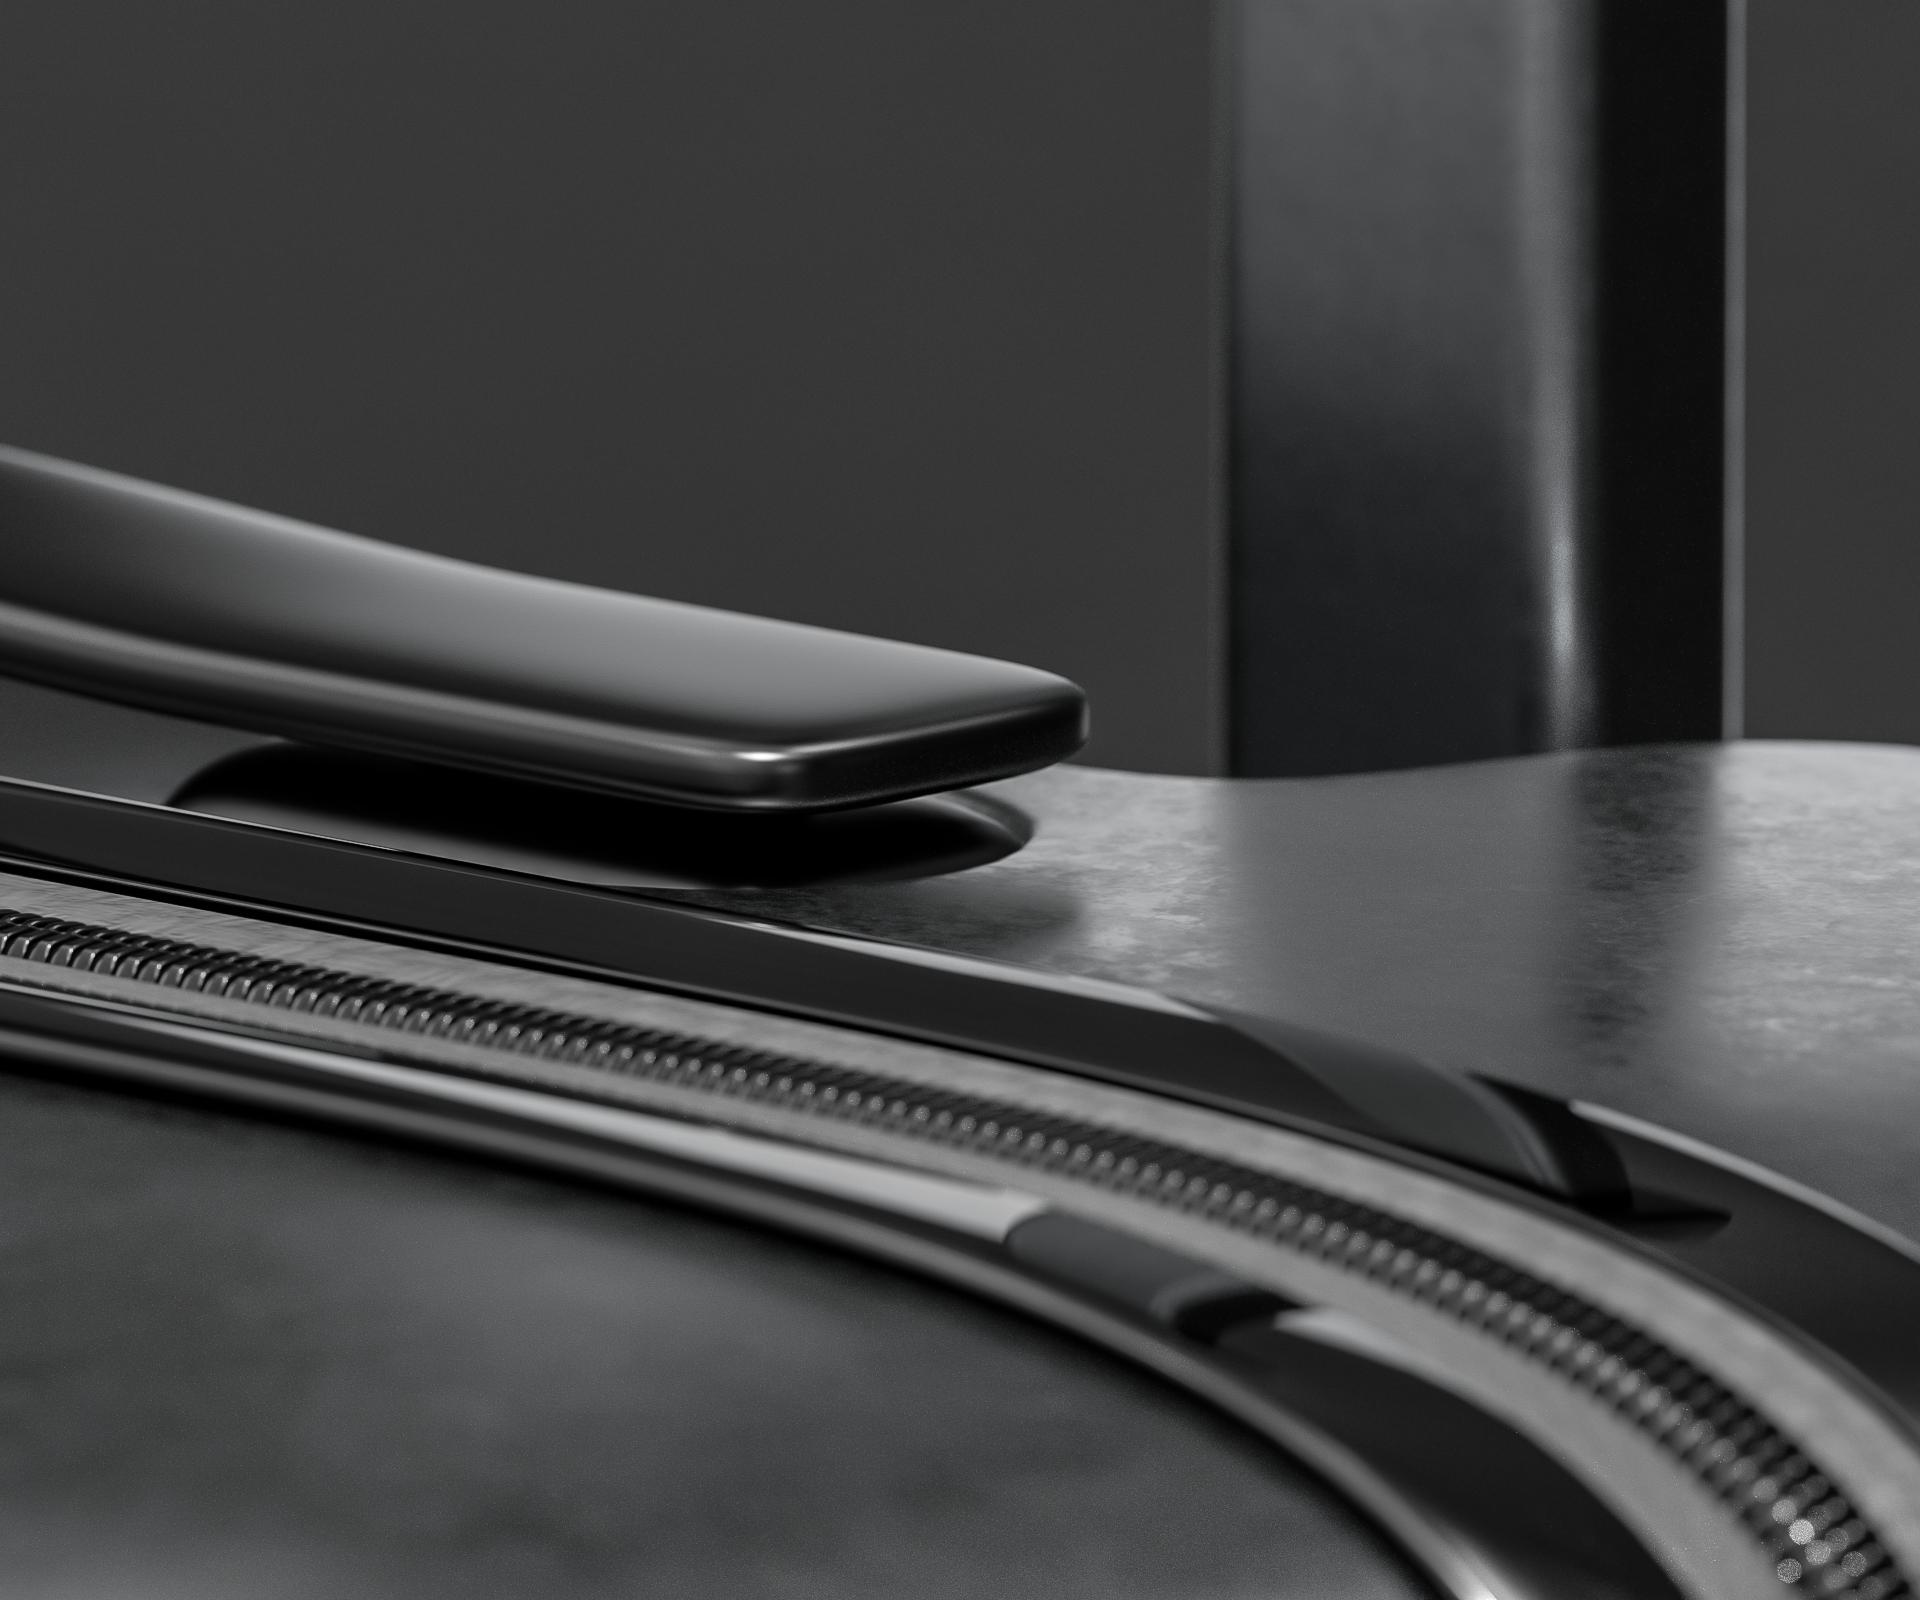 TEst_suitcase_01_Black_02F.png